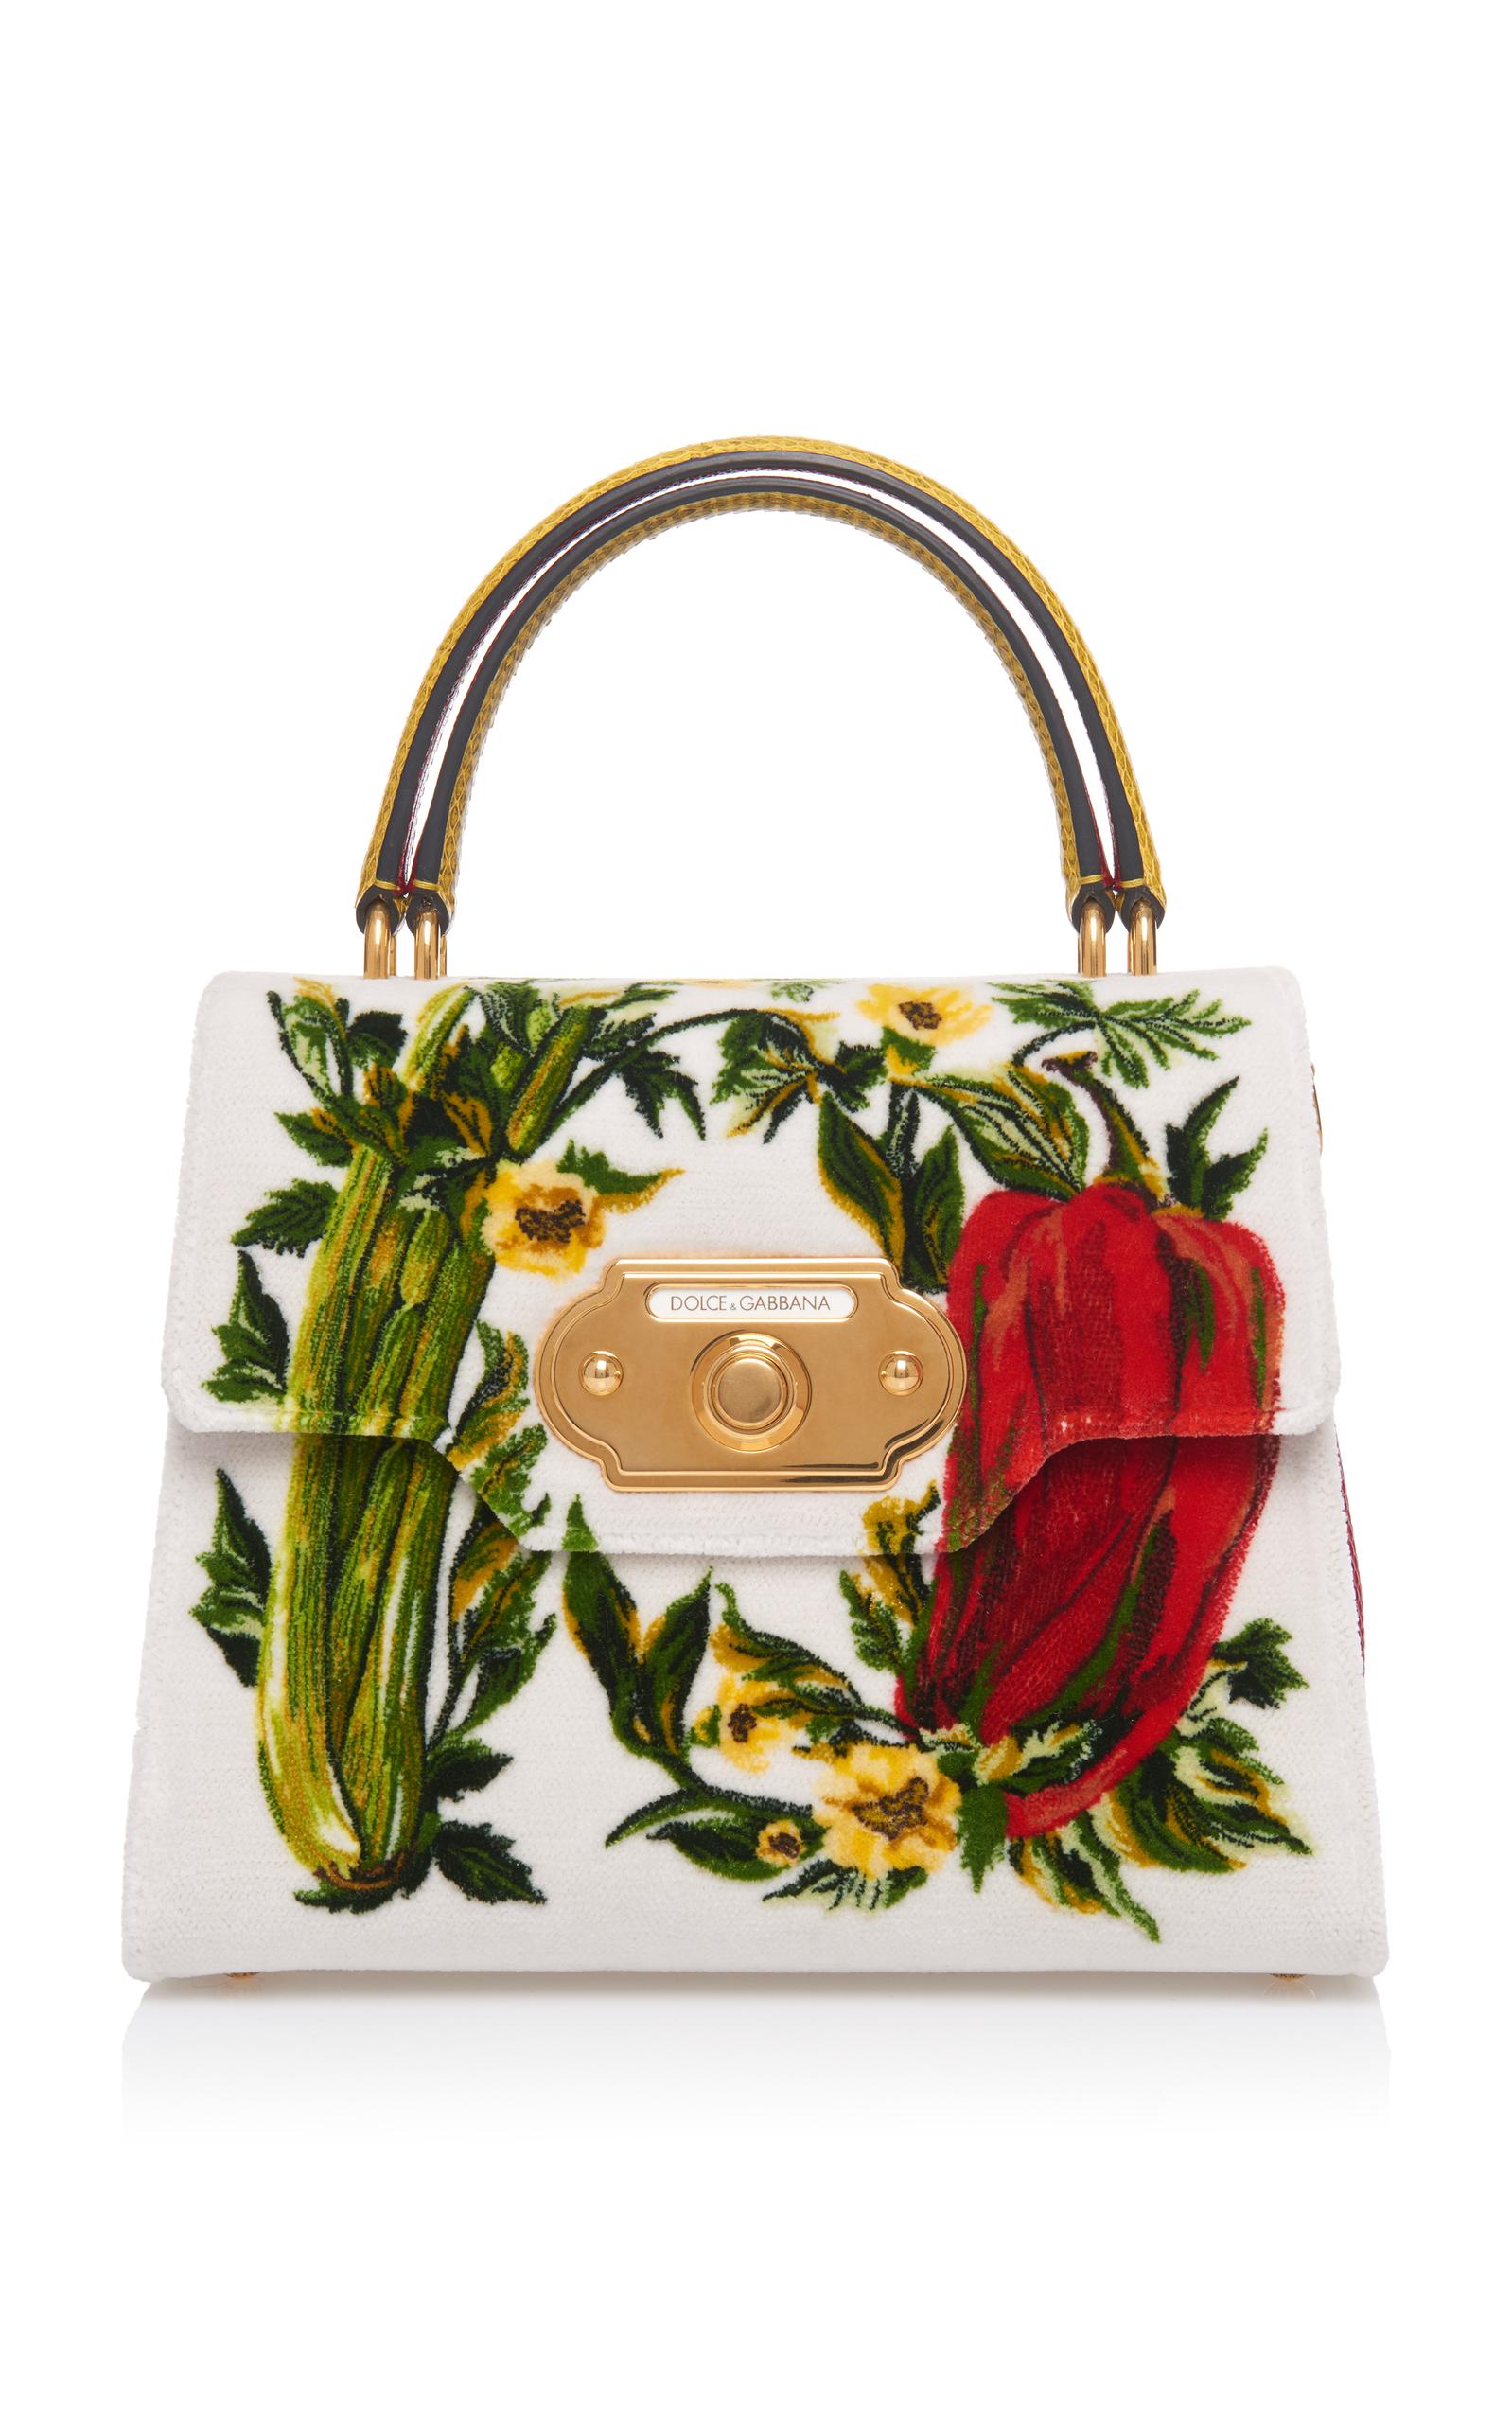 8c461b992410 Medium Welcome Bag by Dolce   Gabbana